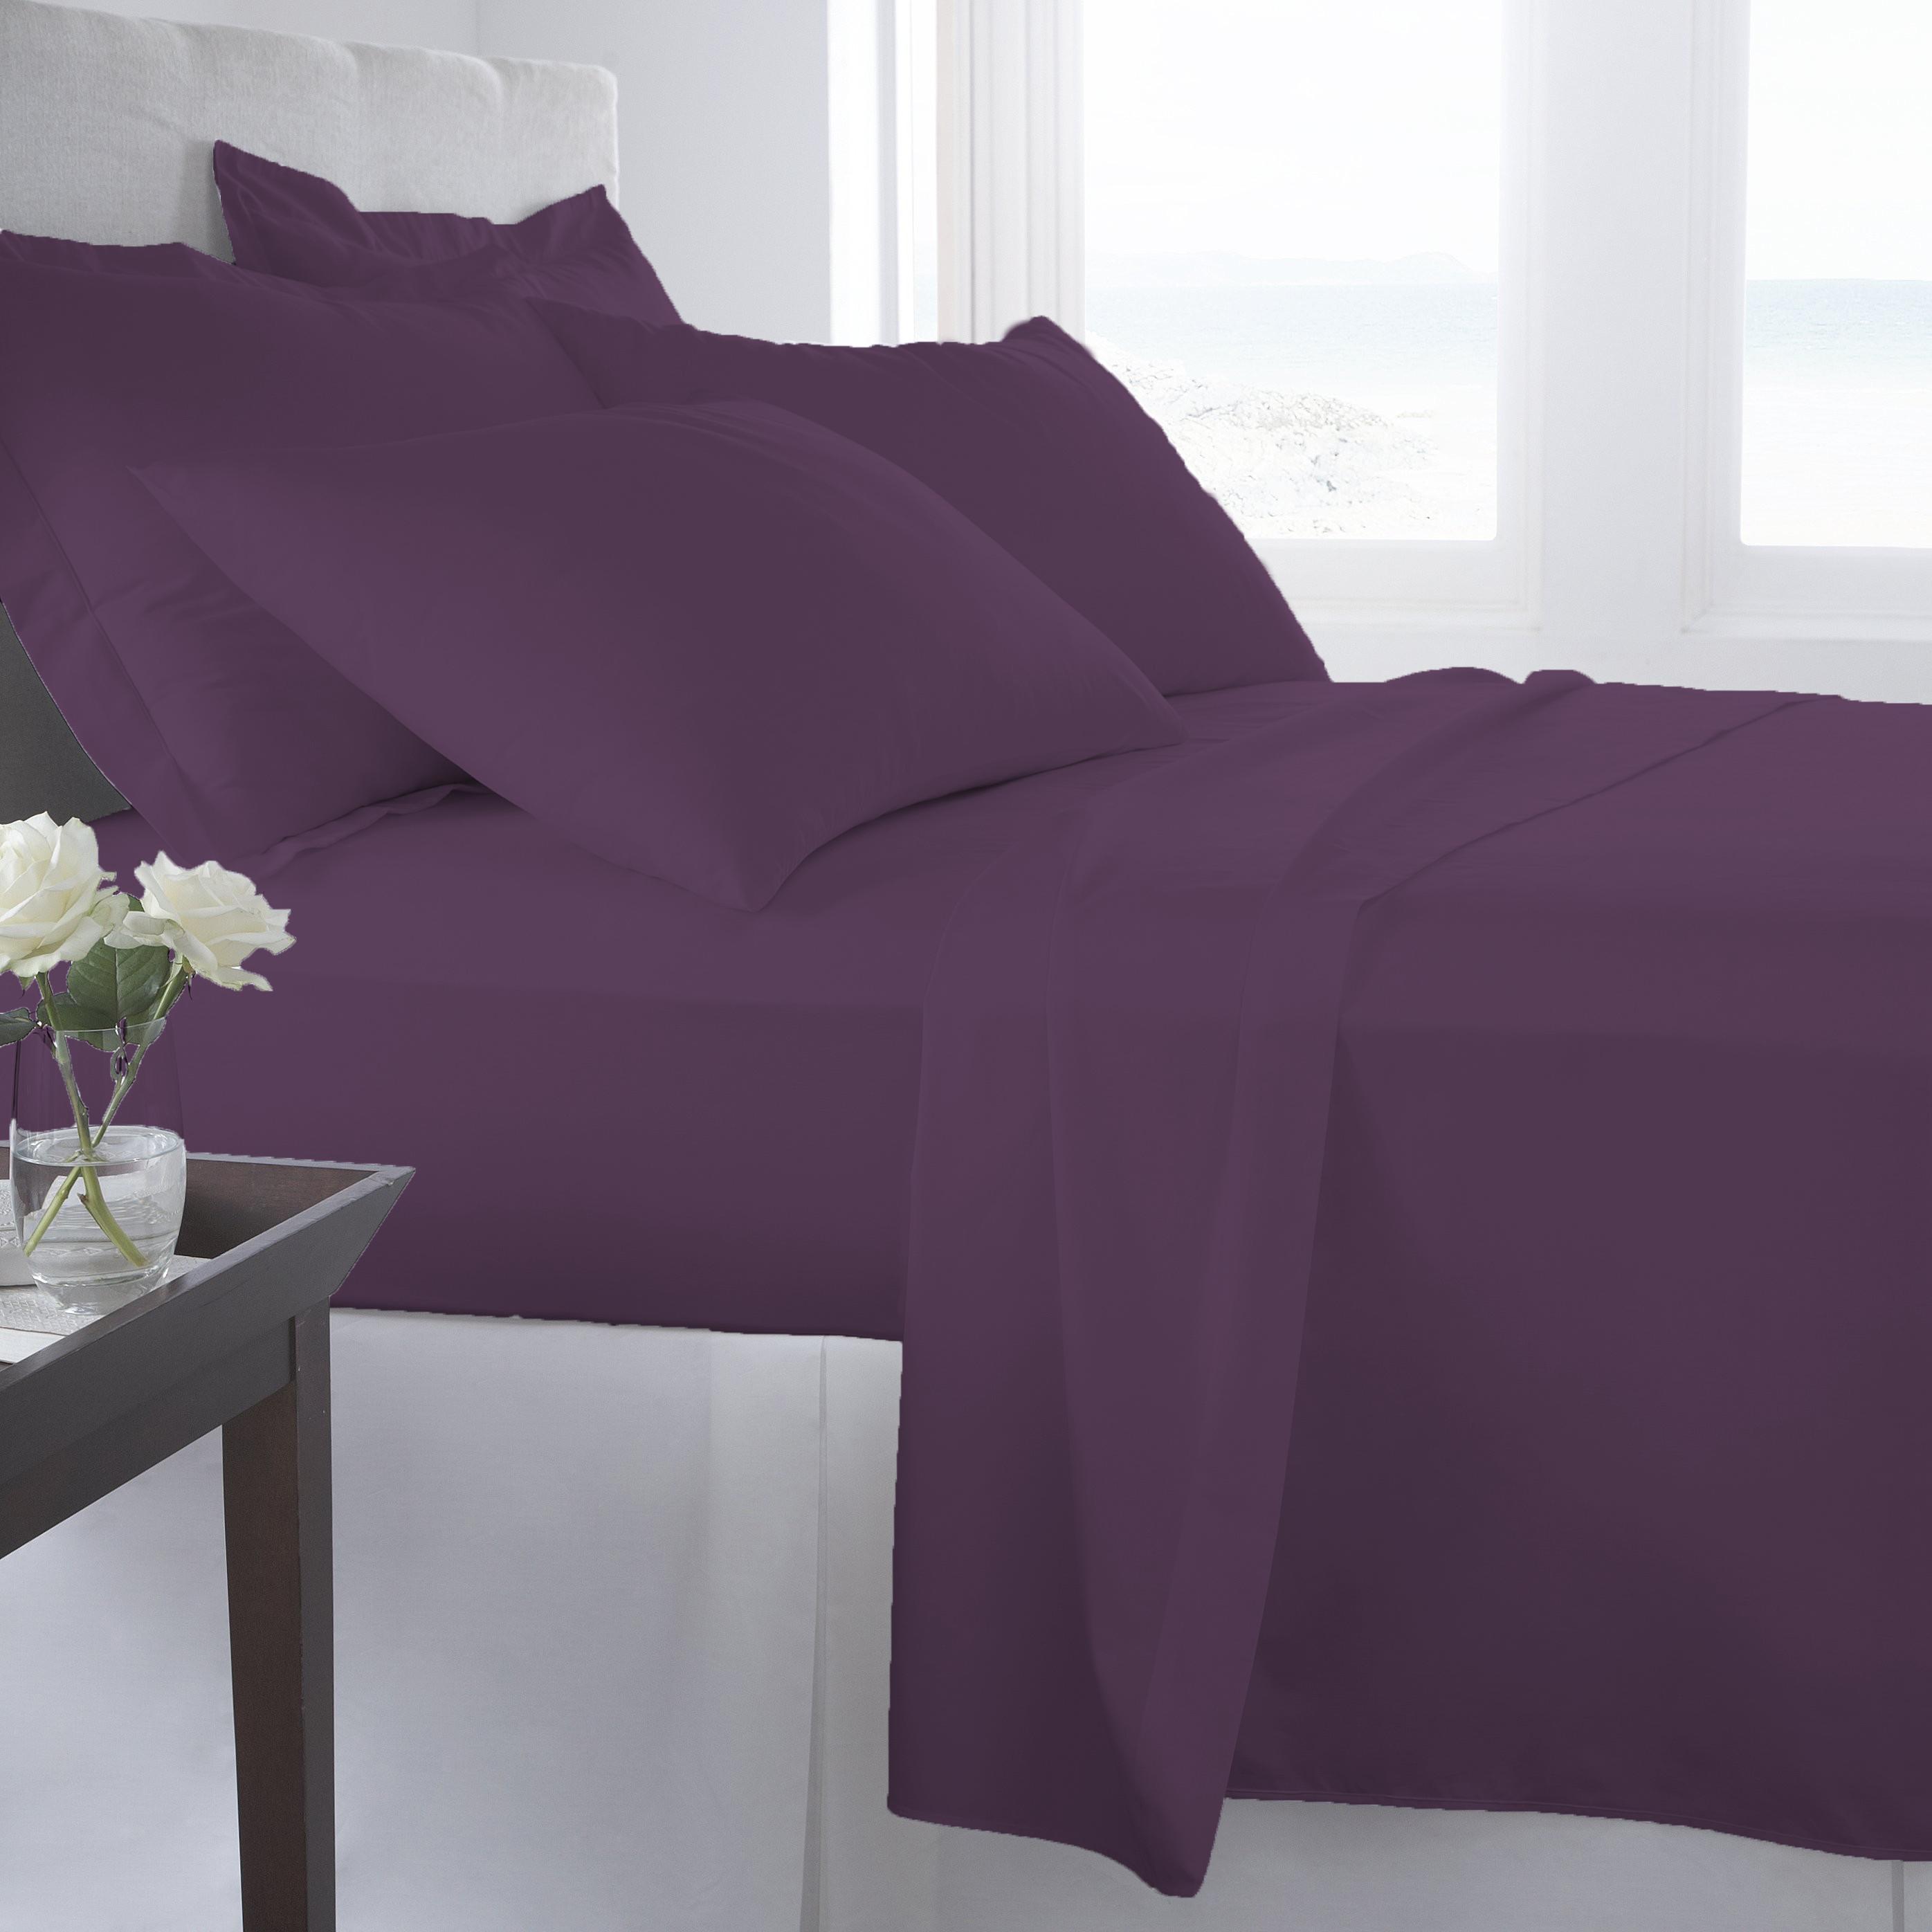 Supreme-Super-Soft-4-Piece-Bed-Sheet-Set-Deep-Pocket-Bedding-All-Colors-Sizes thumbnail 27